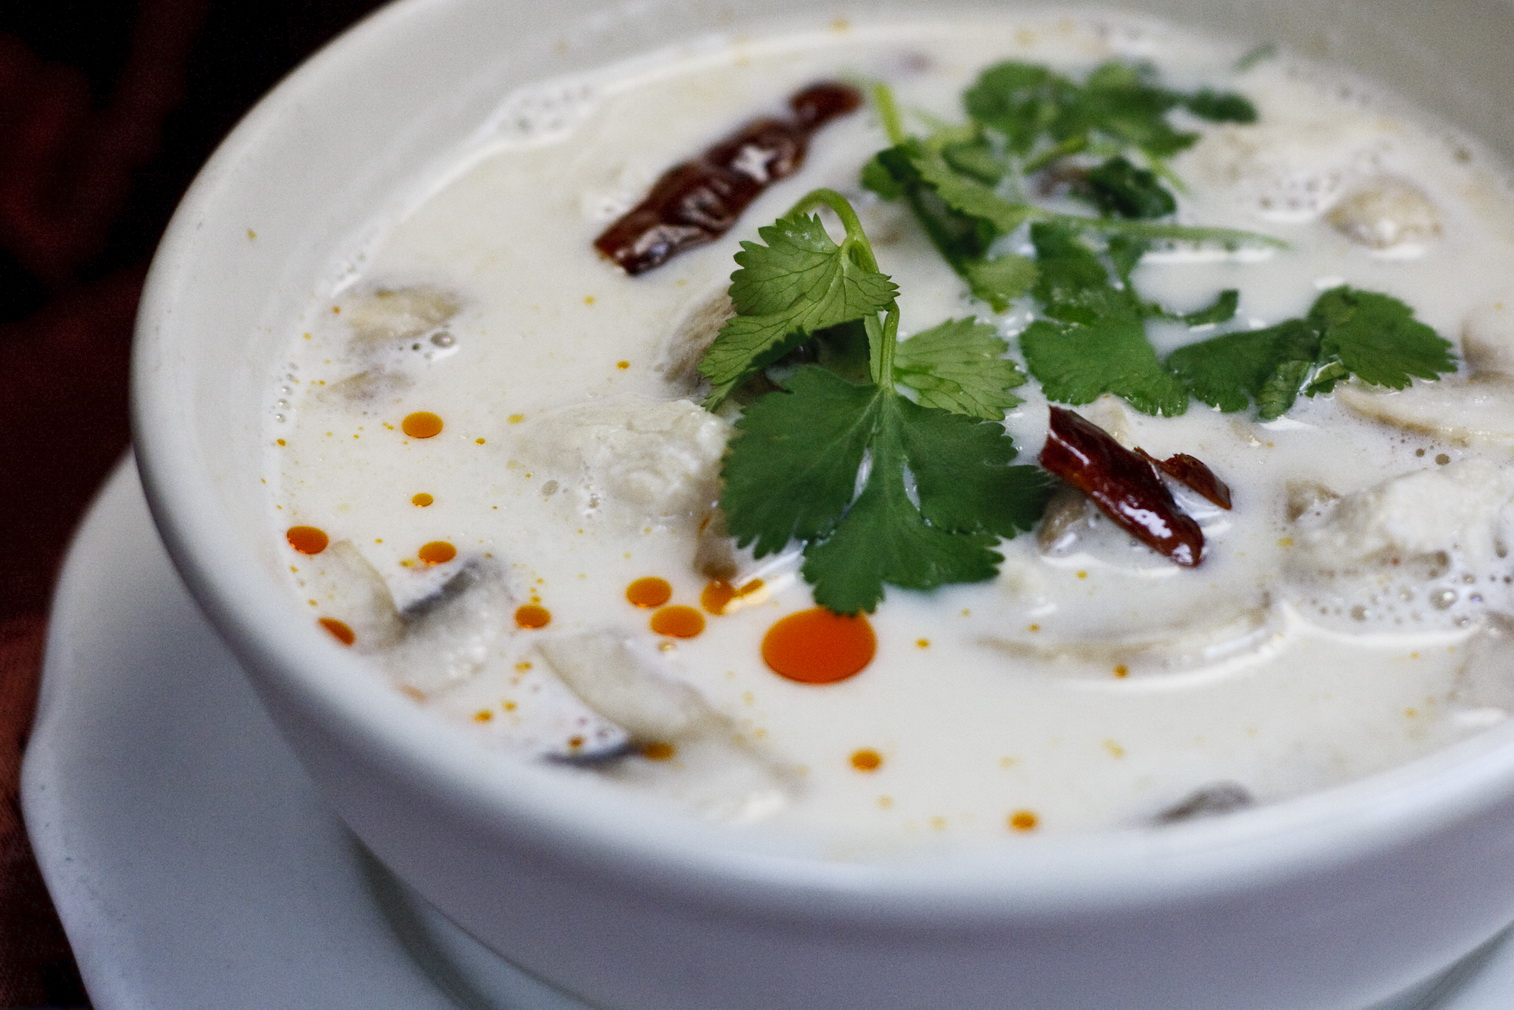 (14) Tom-Kha Soup Image